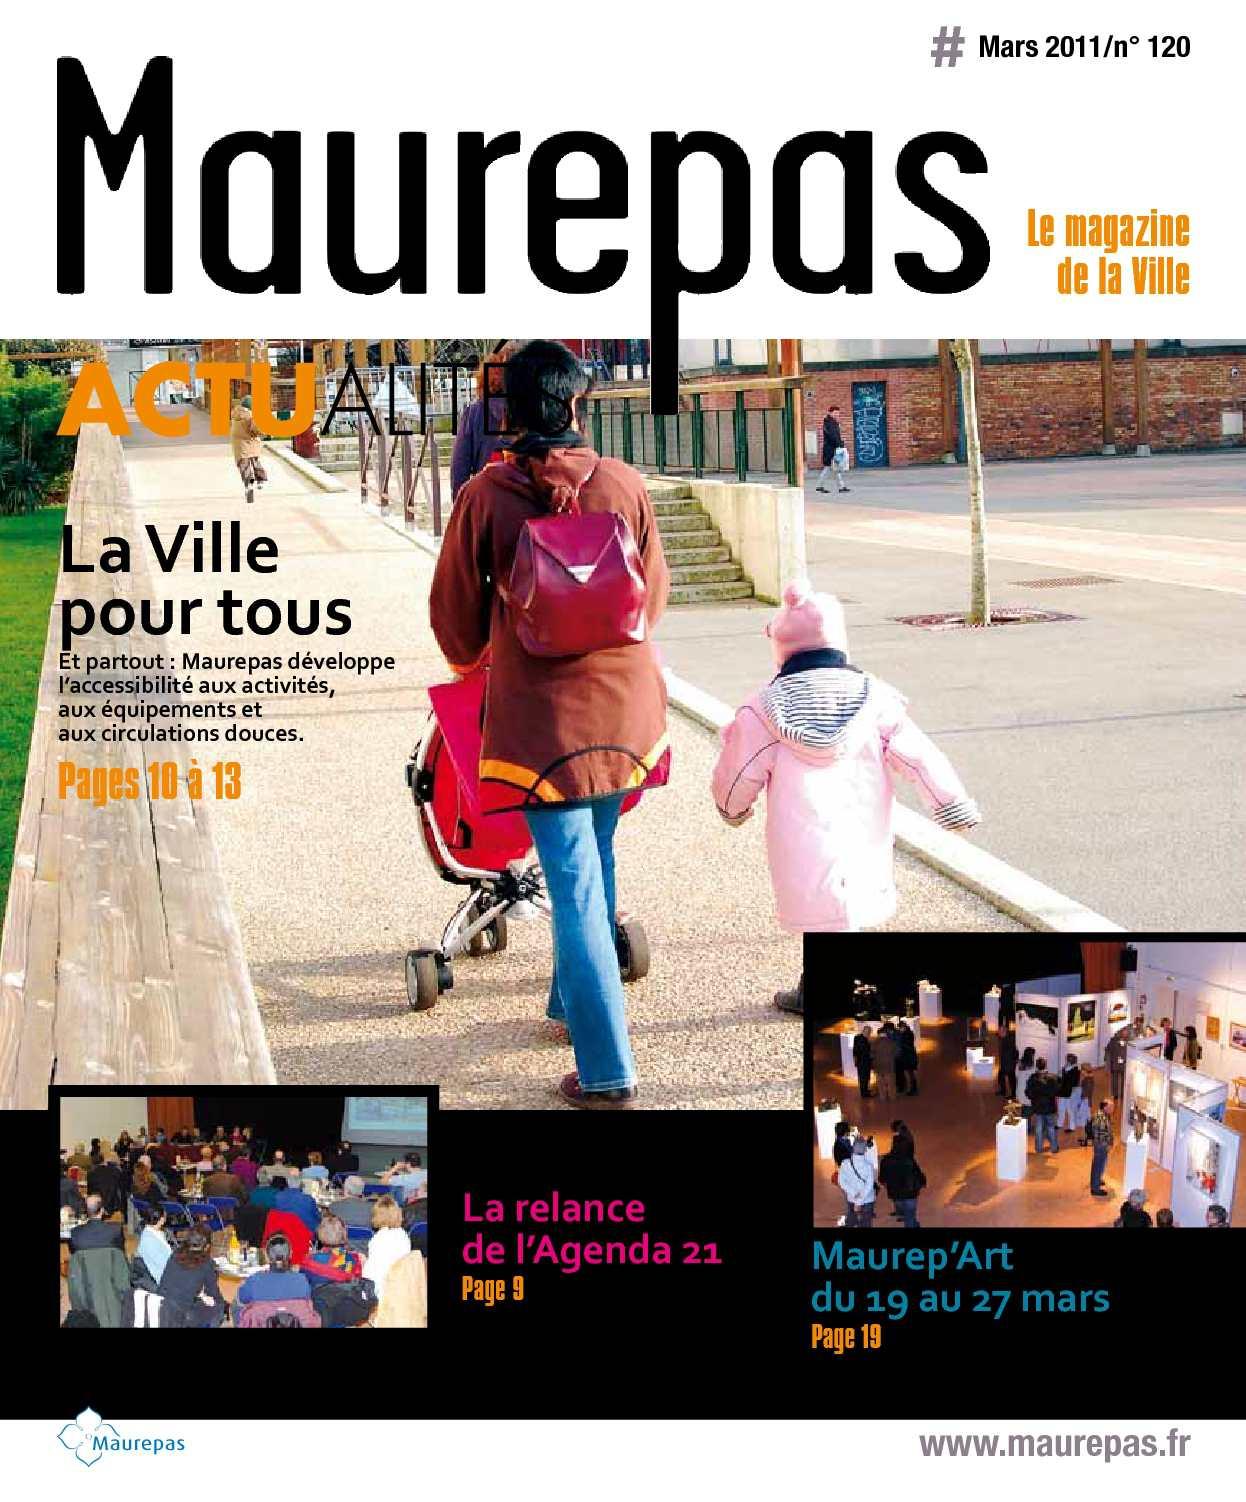 Calam o maurepas actualit s mars 2011 for Piscine goncourt